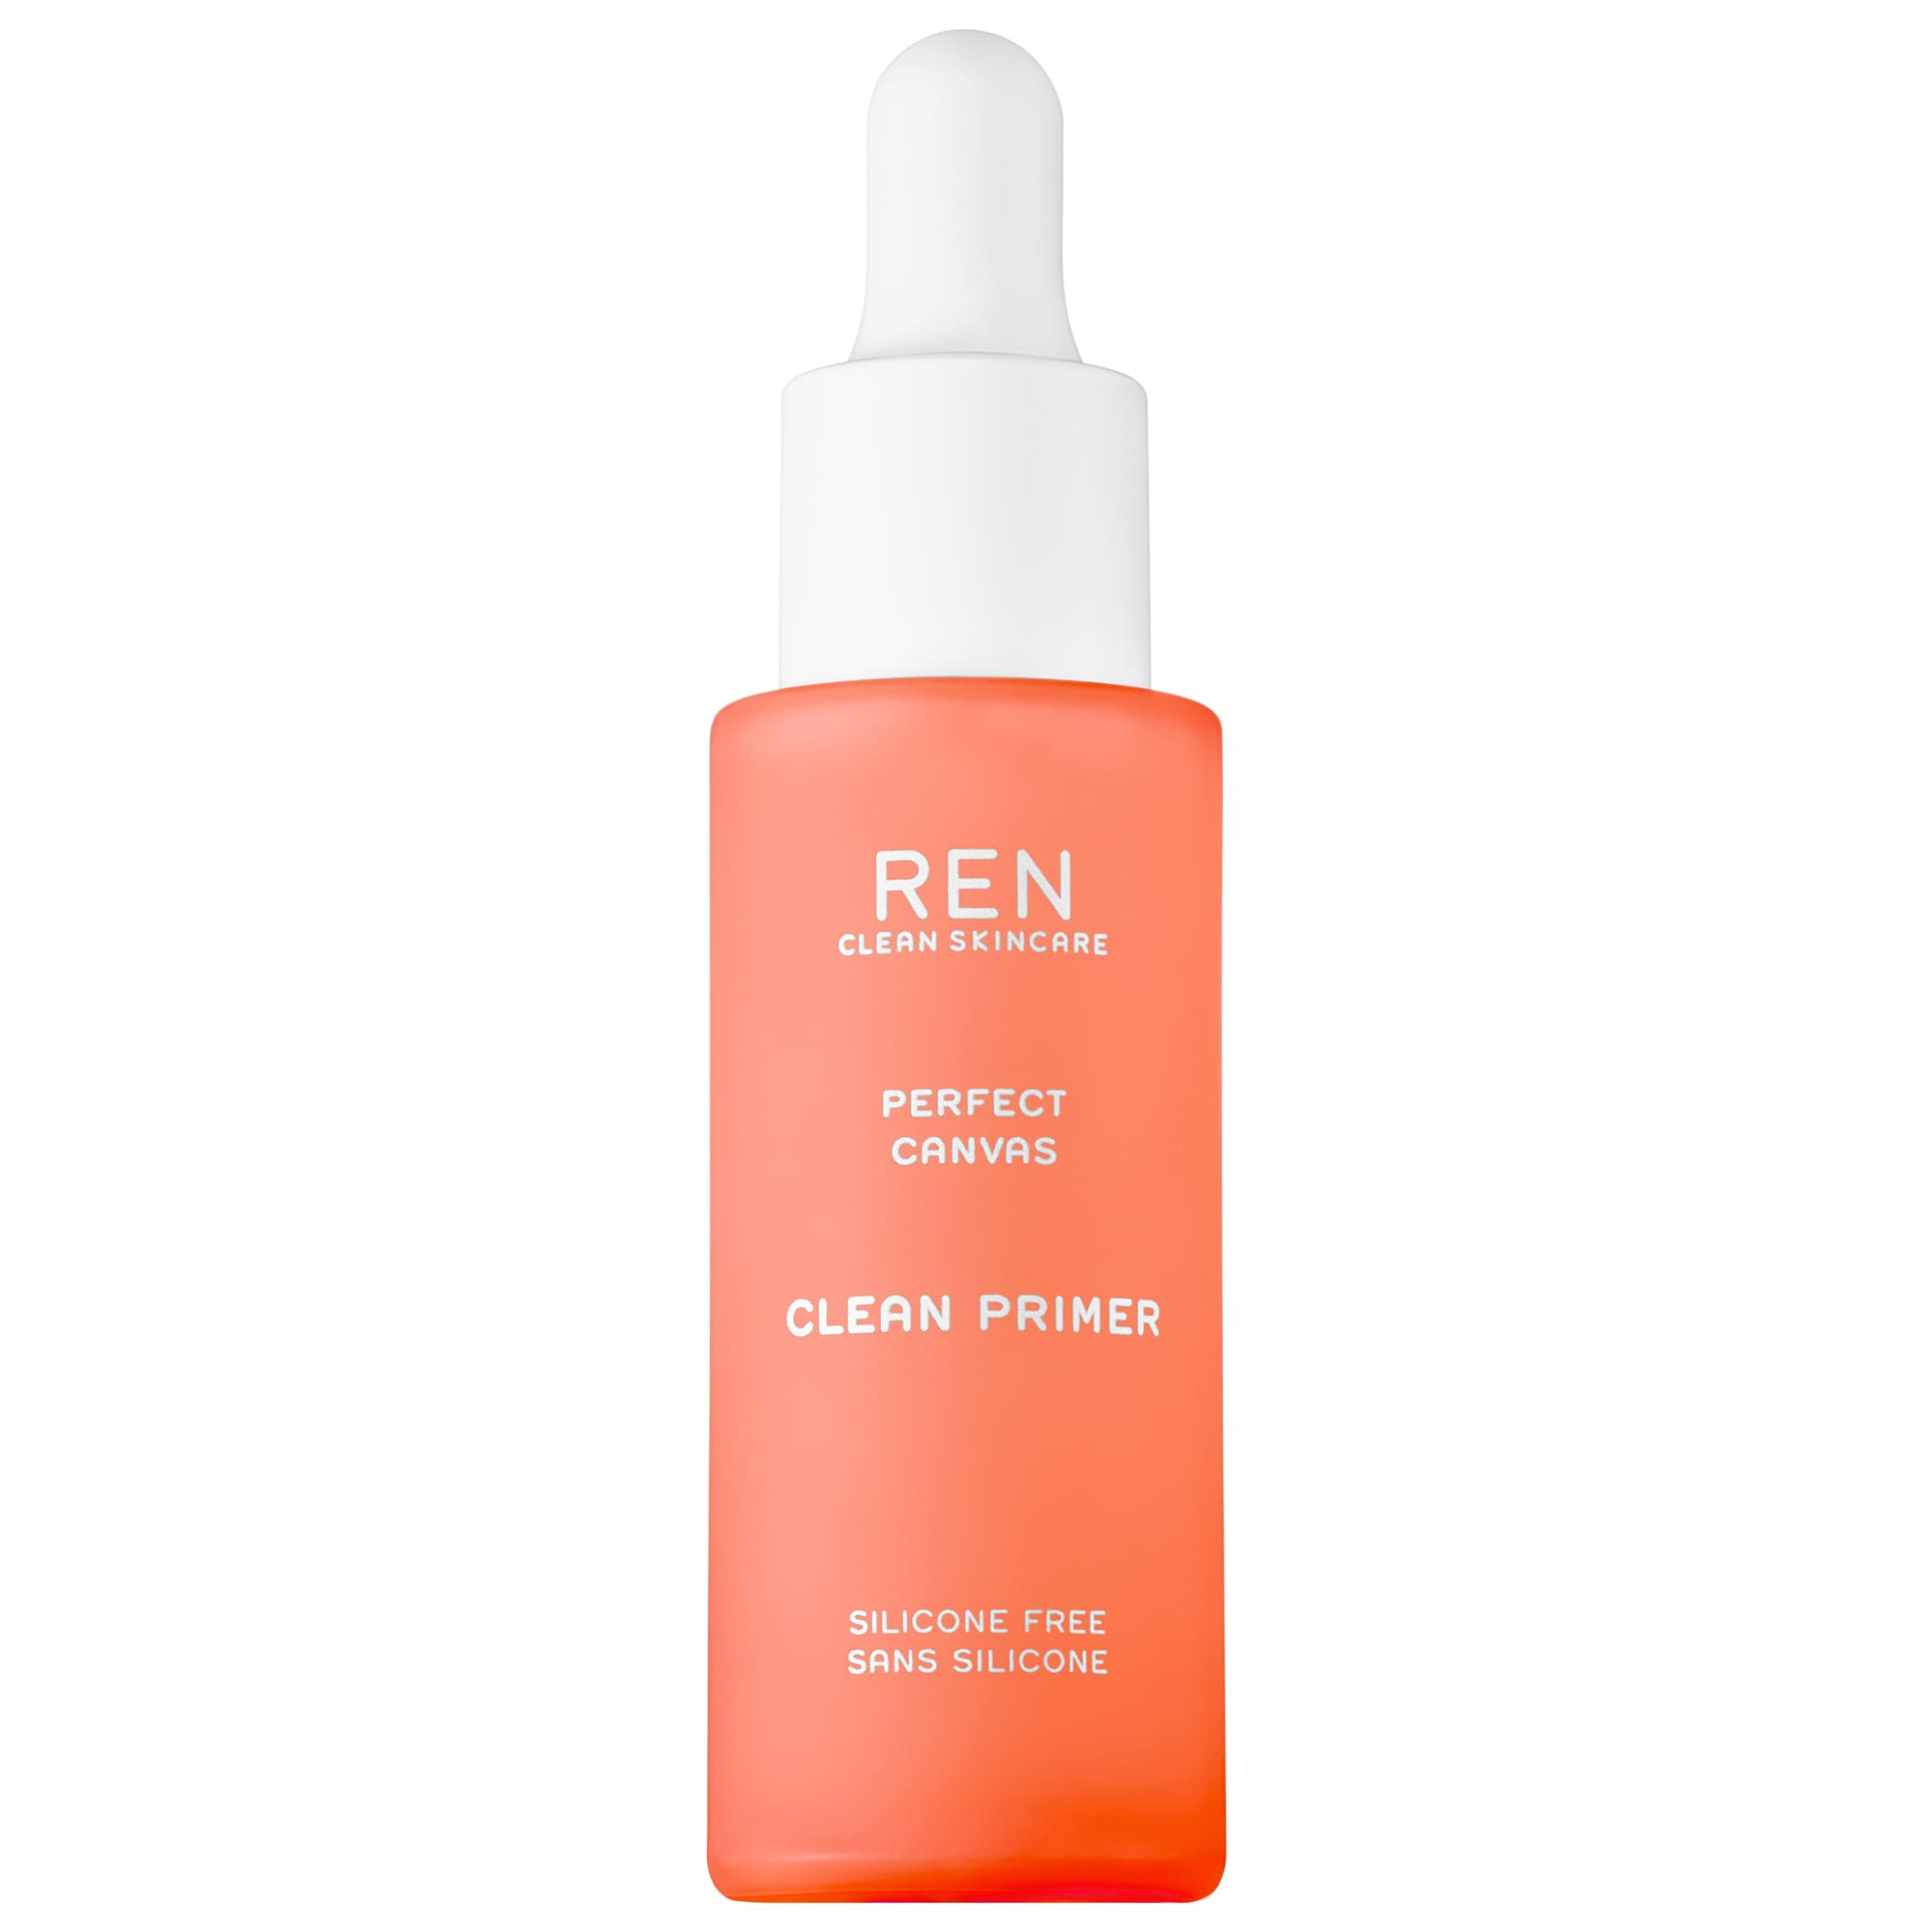 REN Clean Skincare - Perfect Canvas Clean Primer